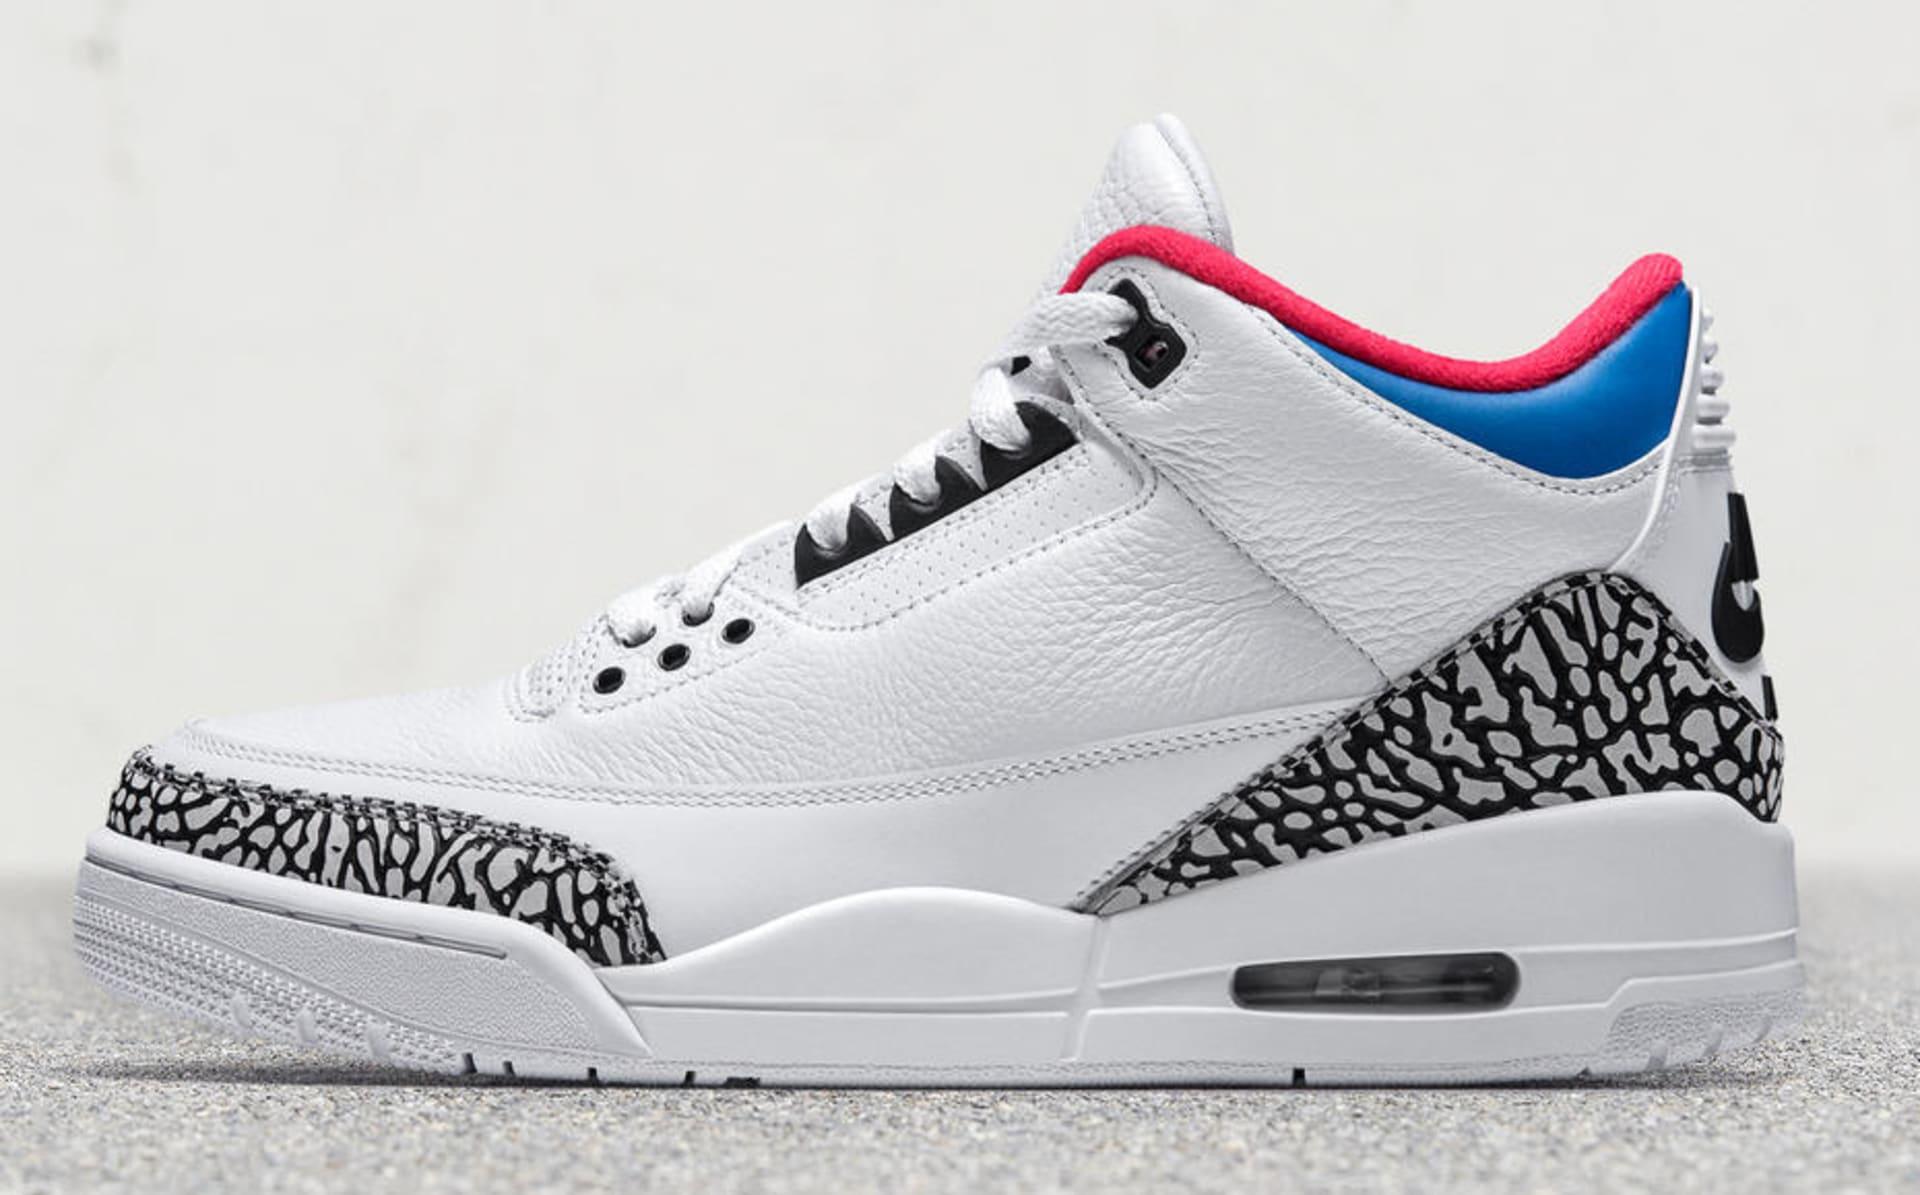 reputable site c1c98 1f69f The Best Air Jordans of 2018 | Complex